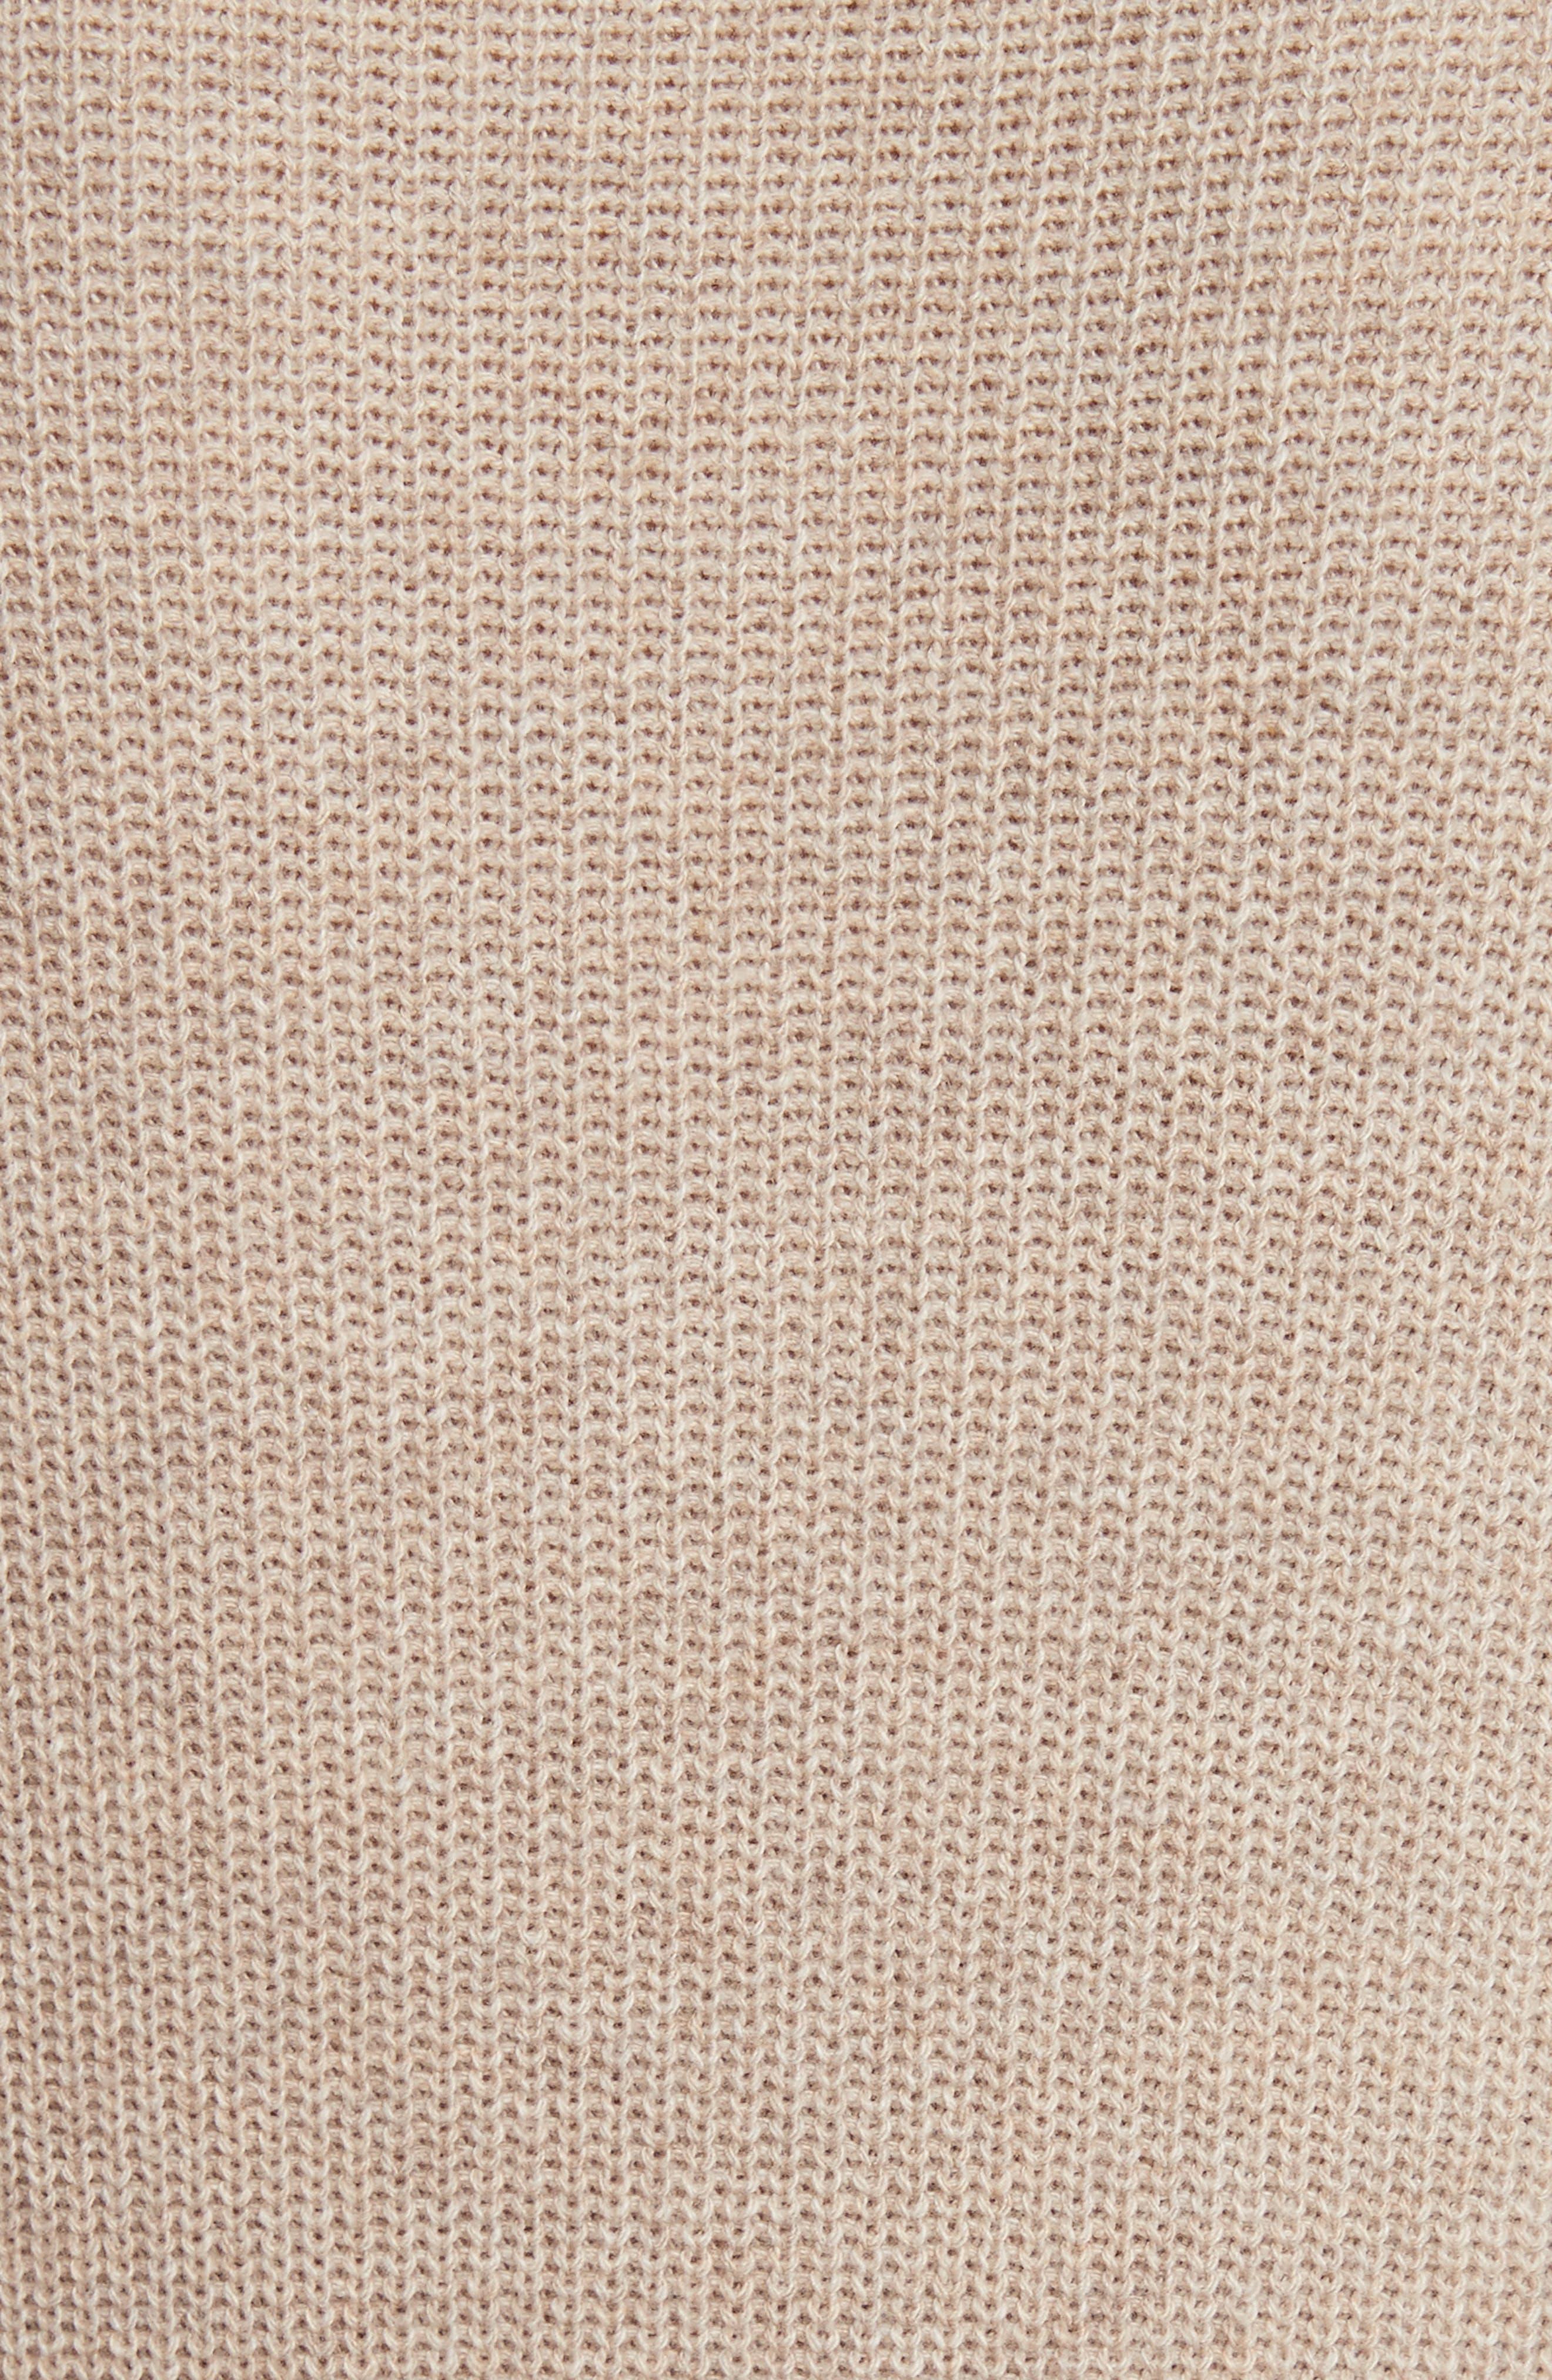 Greys Wrap Sweater,                             Alternate thumbnail 5, color,                             270